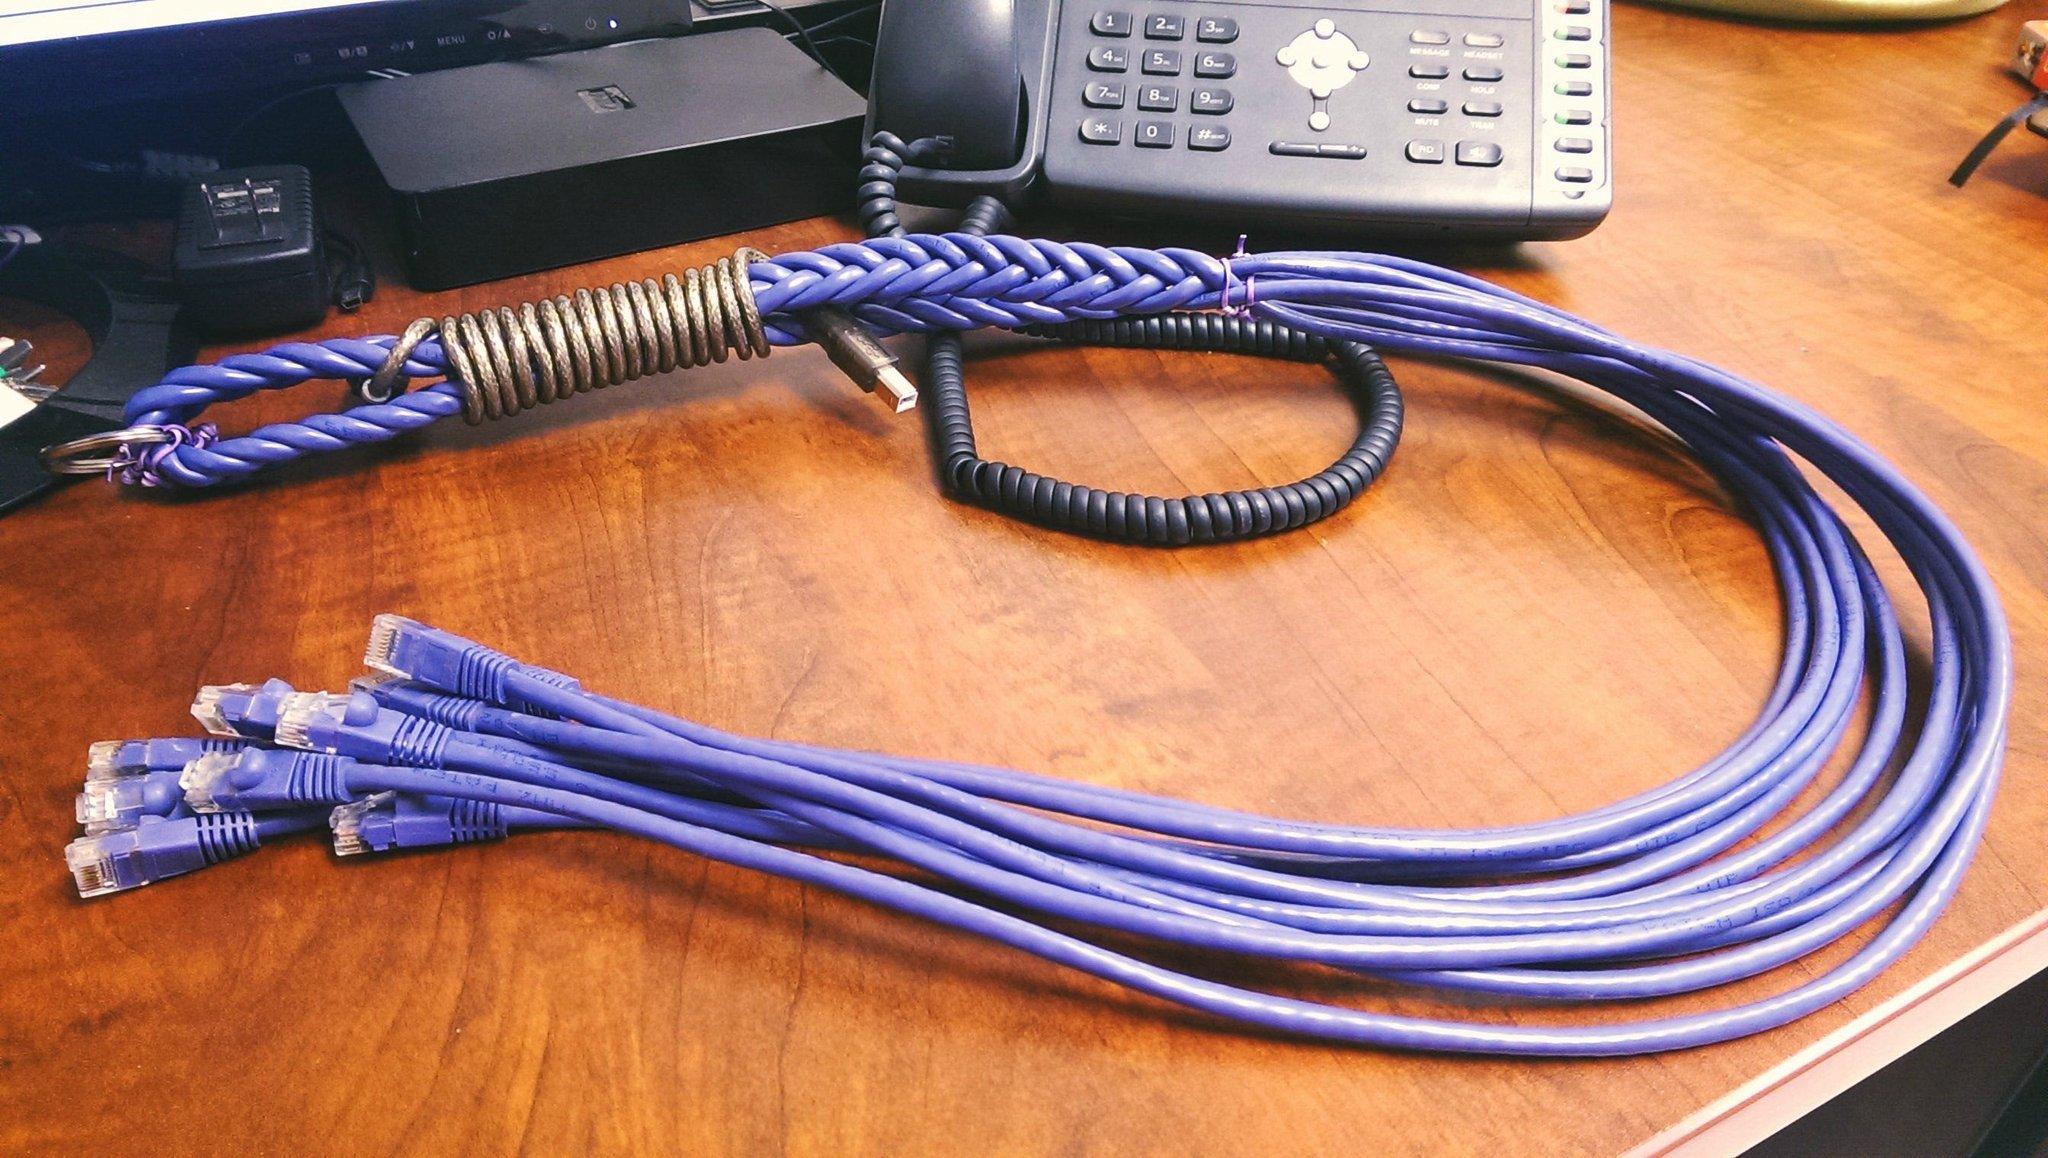 cableporn.jpg